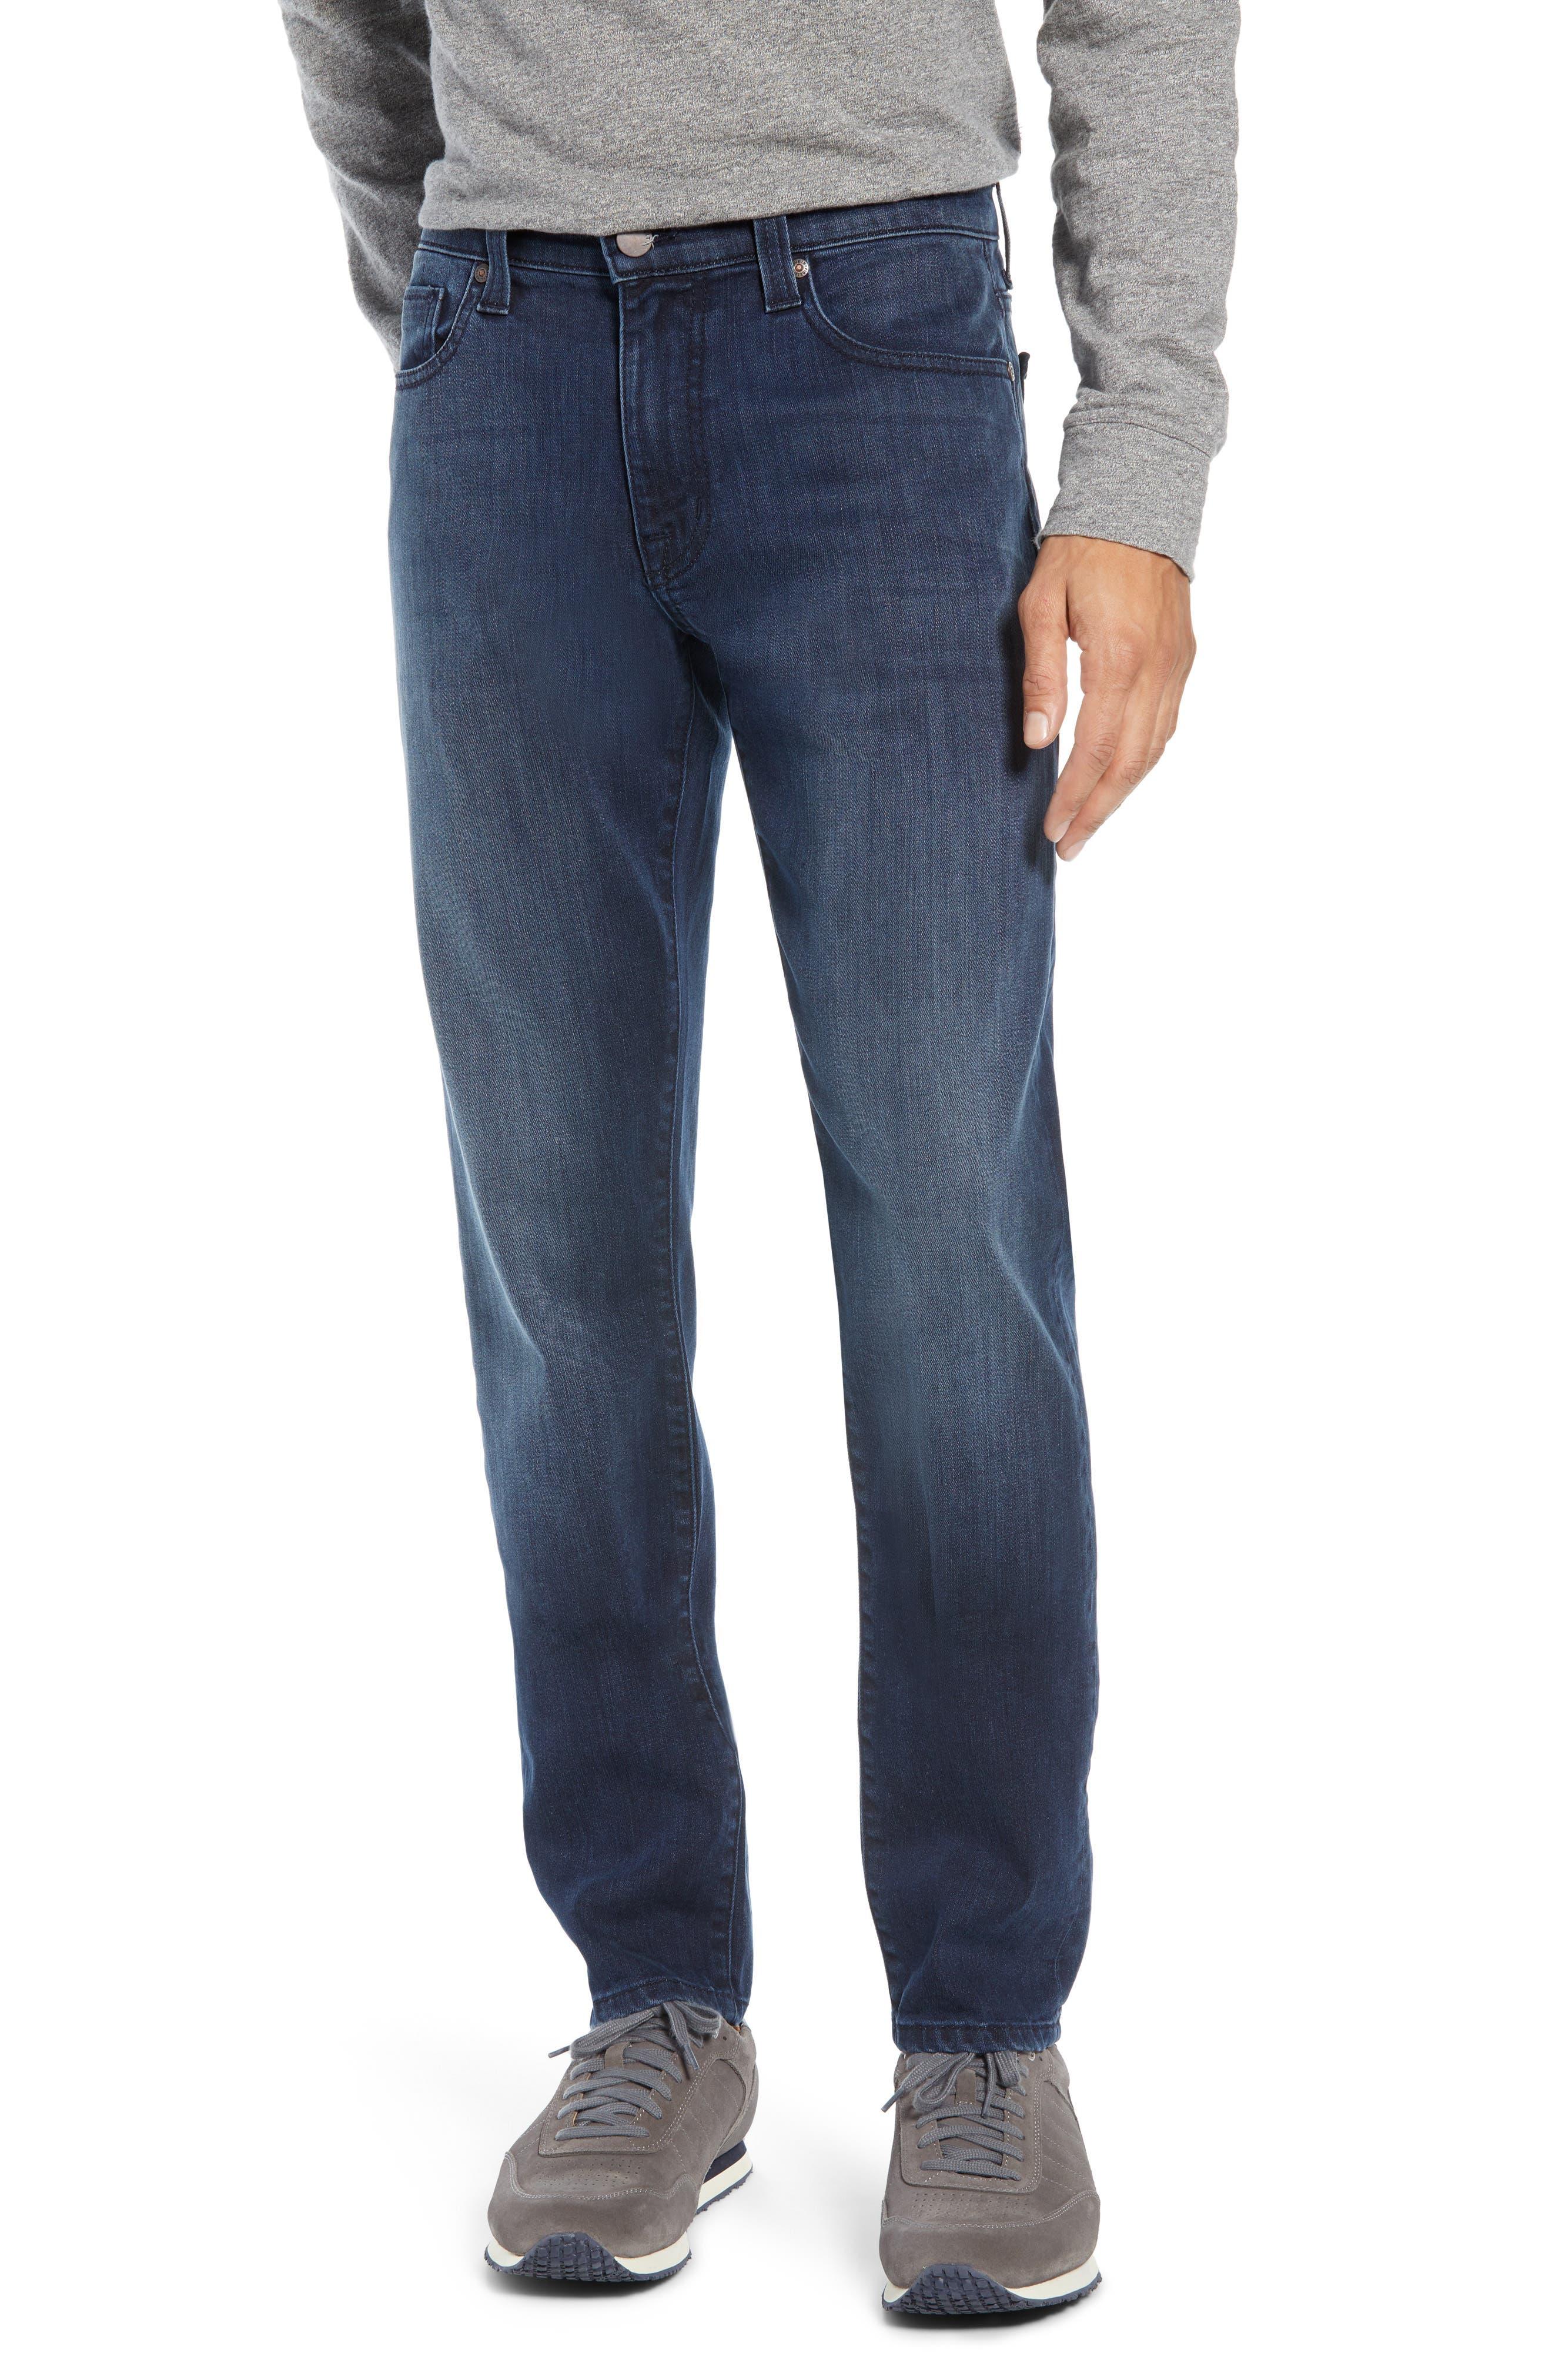 FIDELITY DENIM,                             Torino Slim Fit Jeans,                             Main thumbnail 1, color,                             SPECTRE